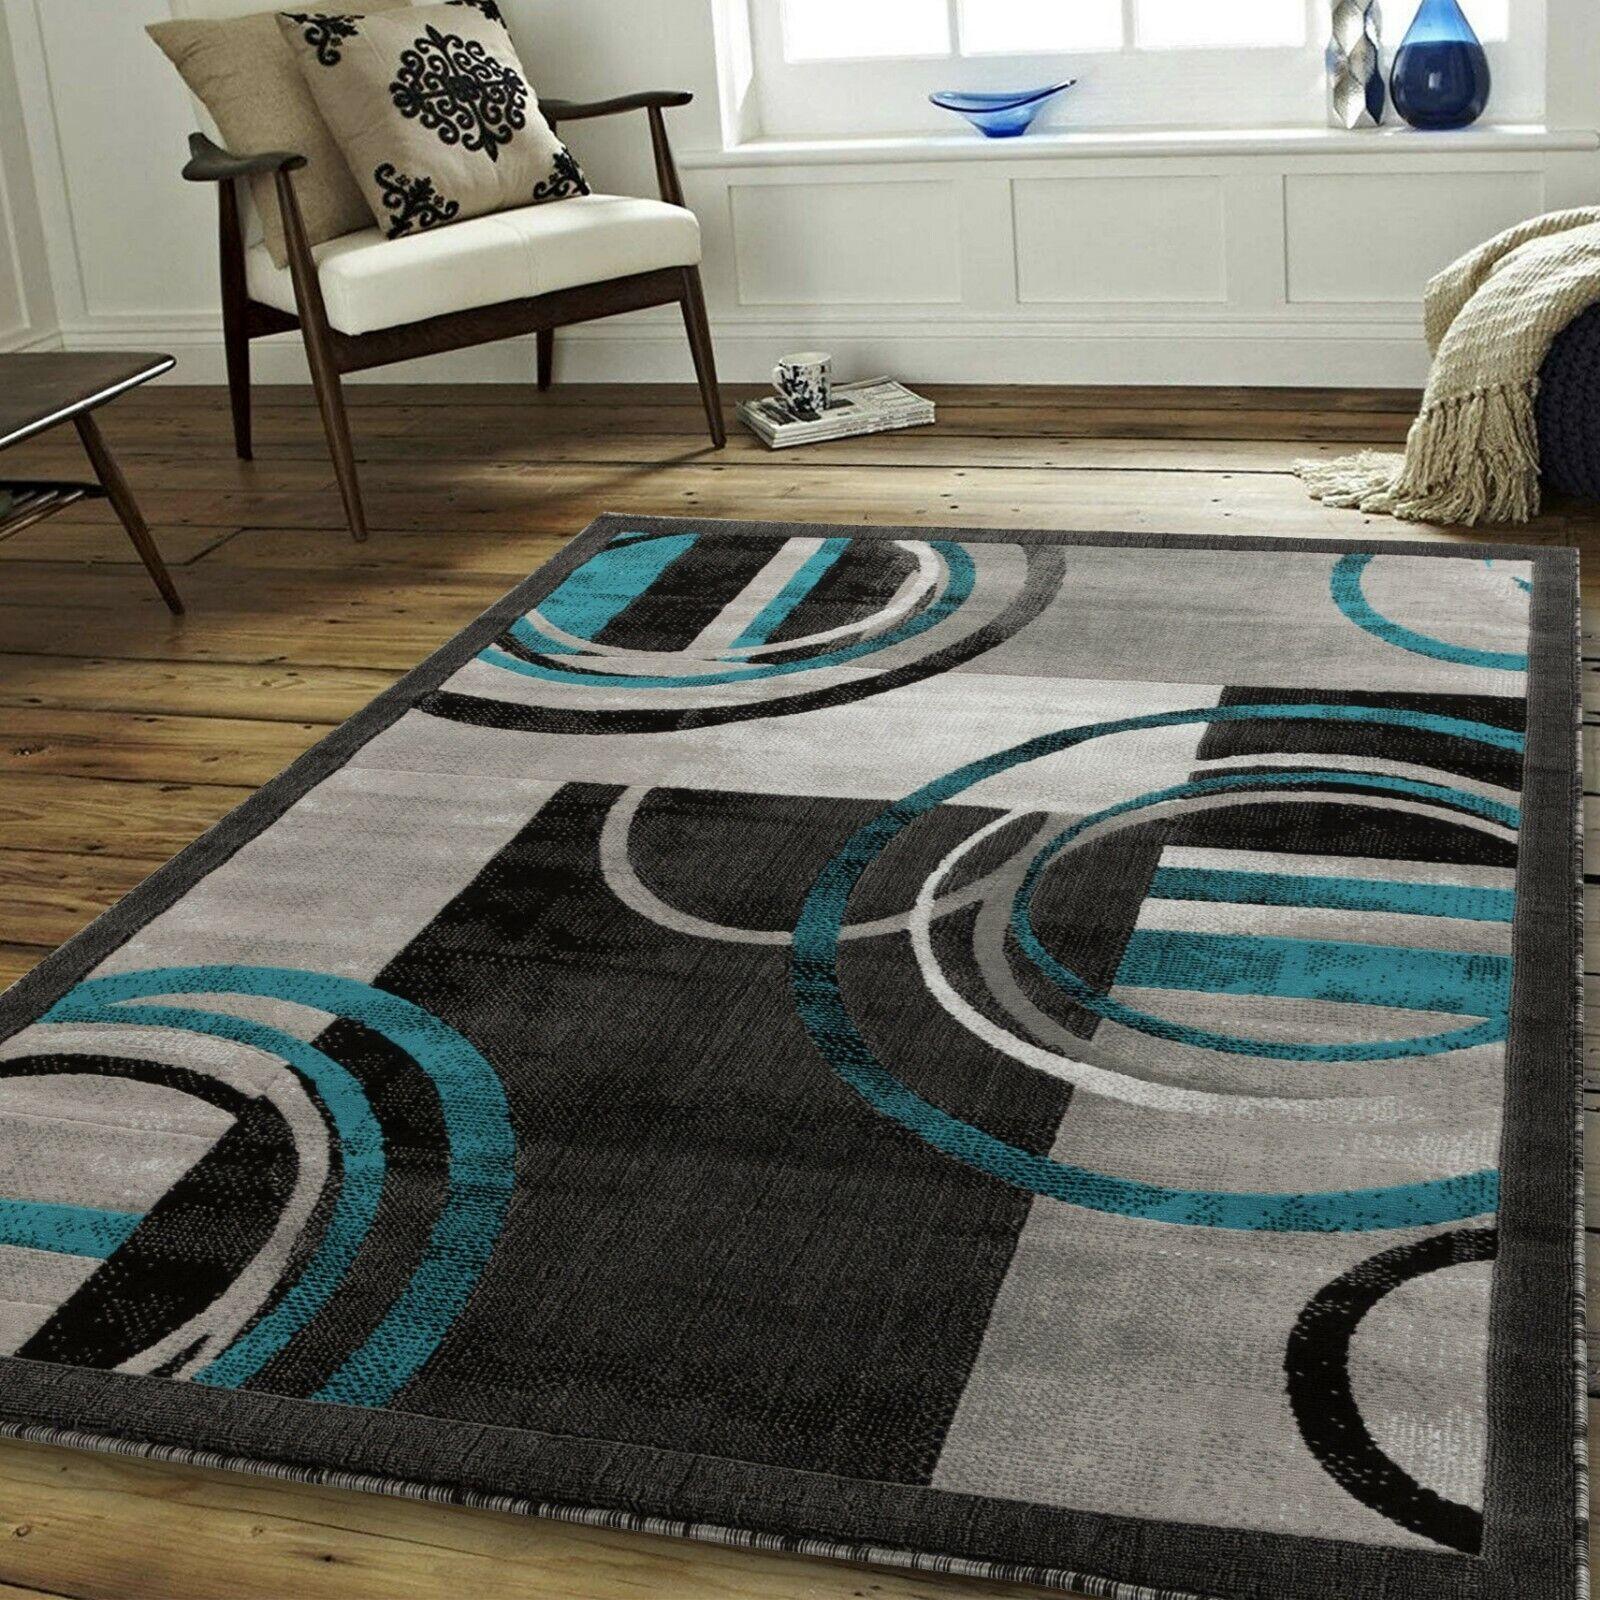 Area rug Newprt #53 Modern blue gray soft pile size option 2